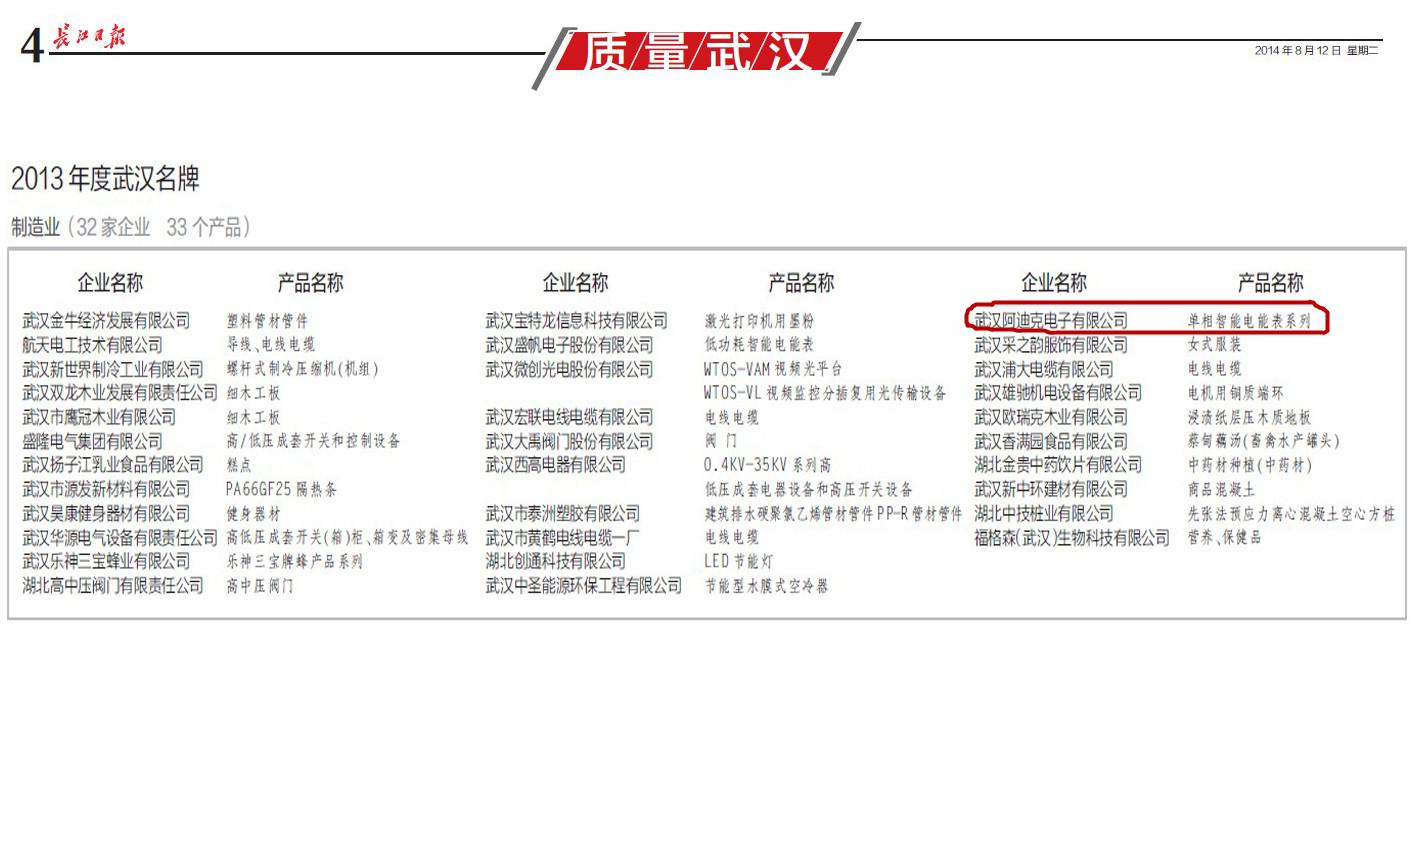 RADARKING Awarded as '2013 Wuhan Brand'